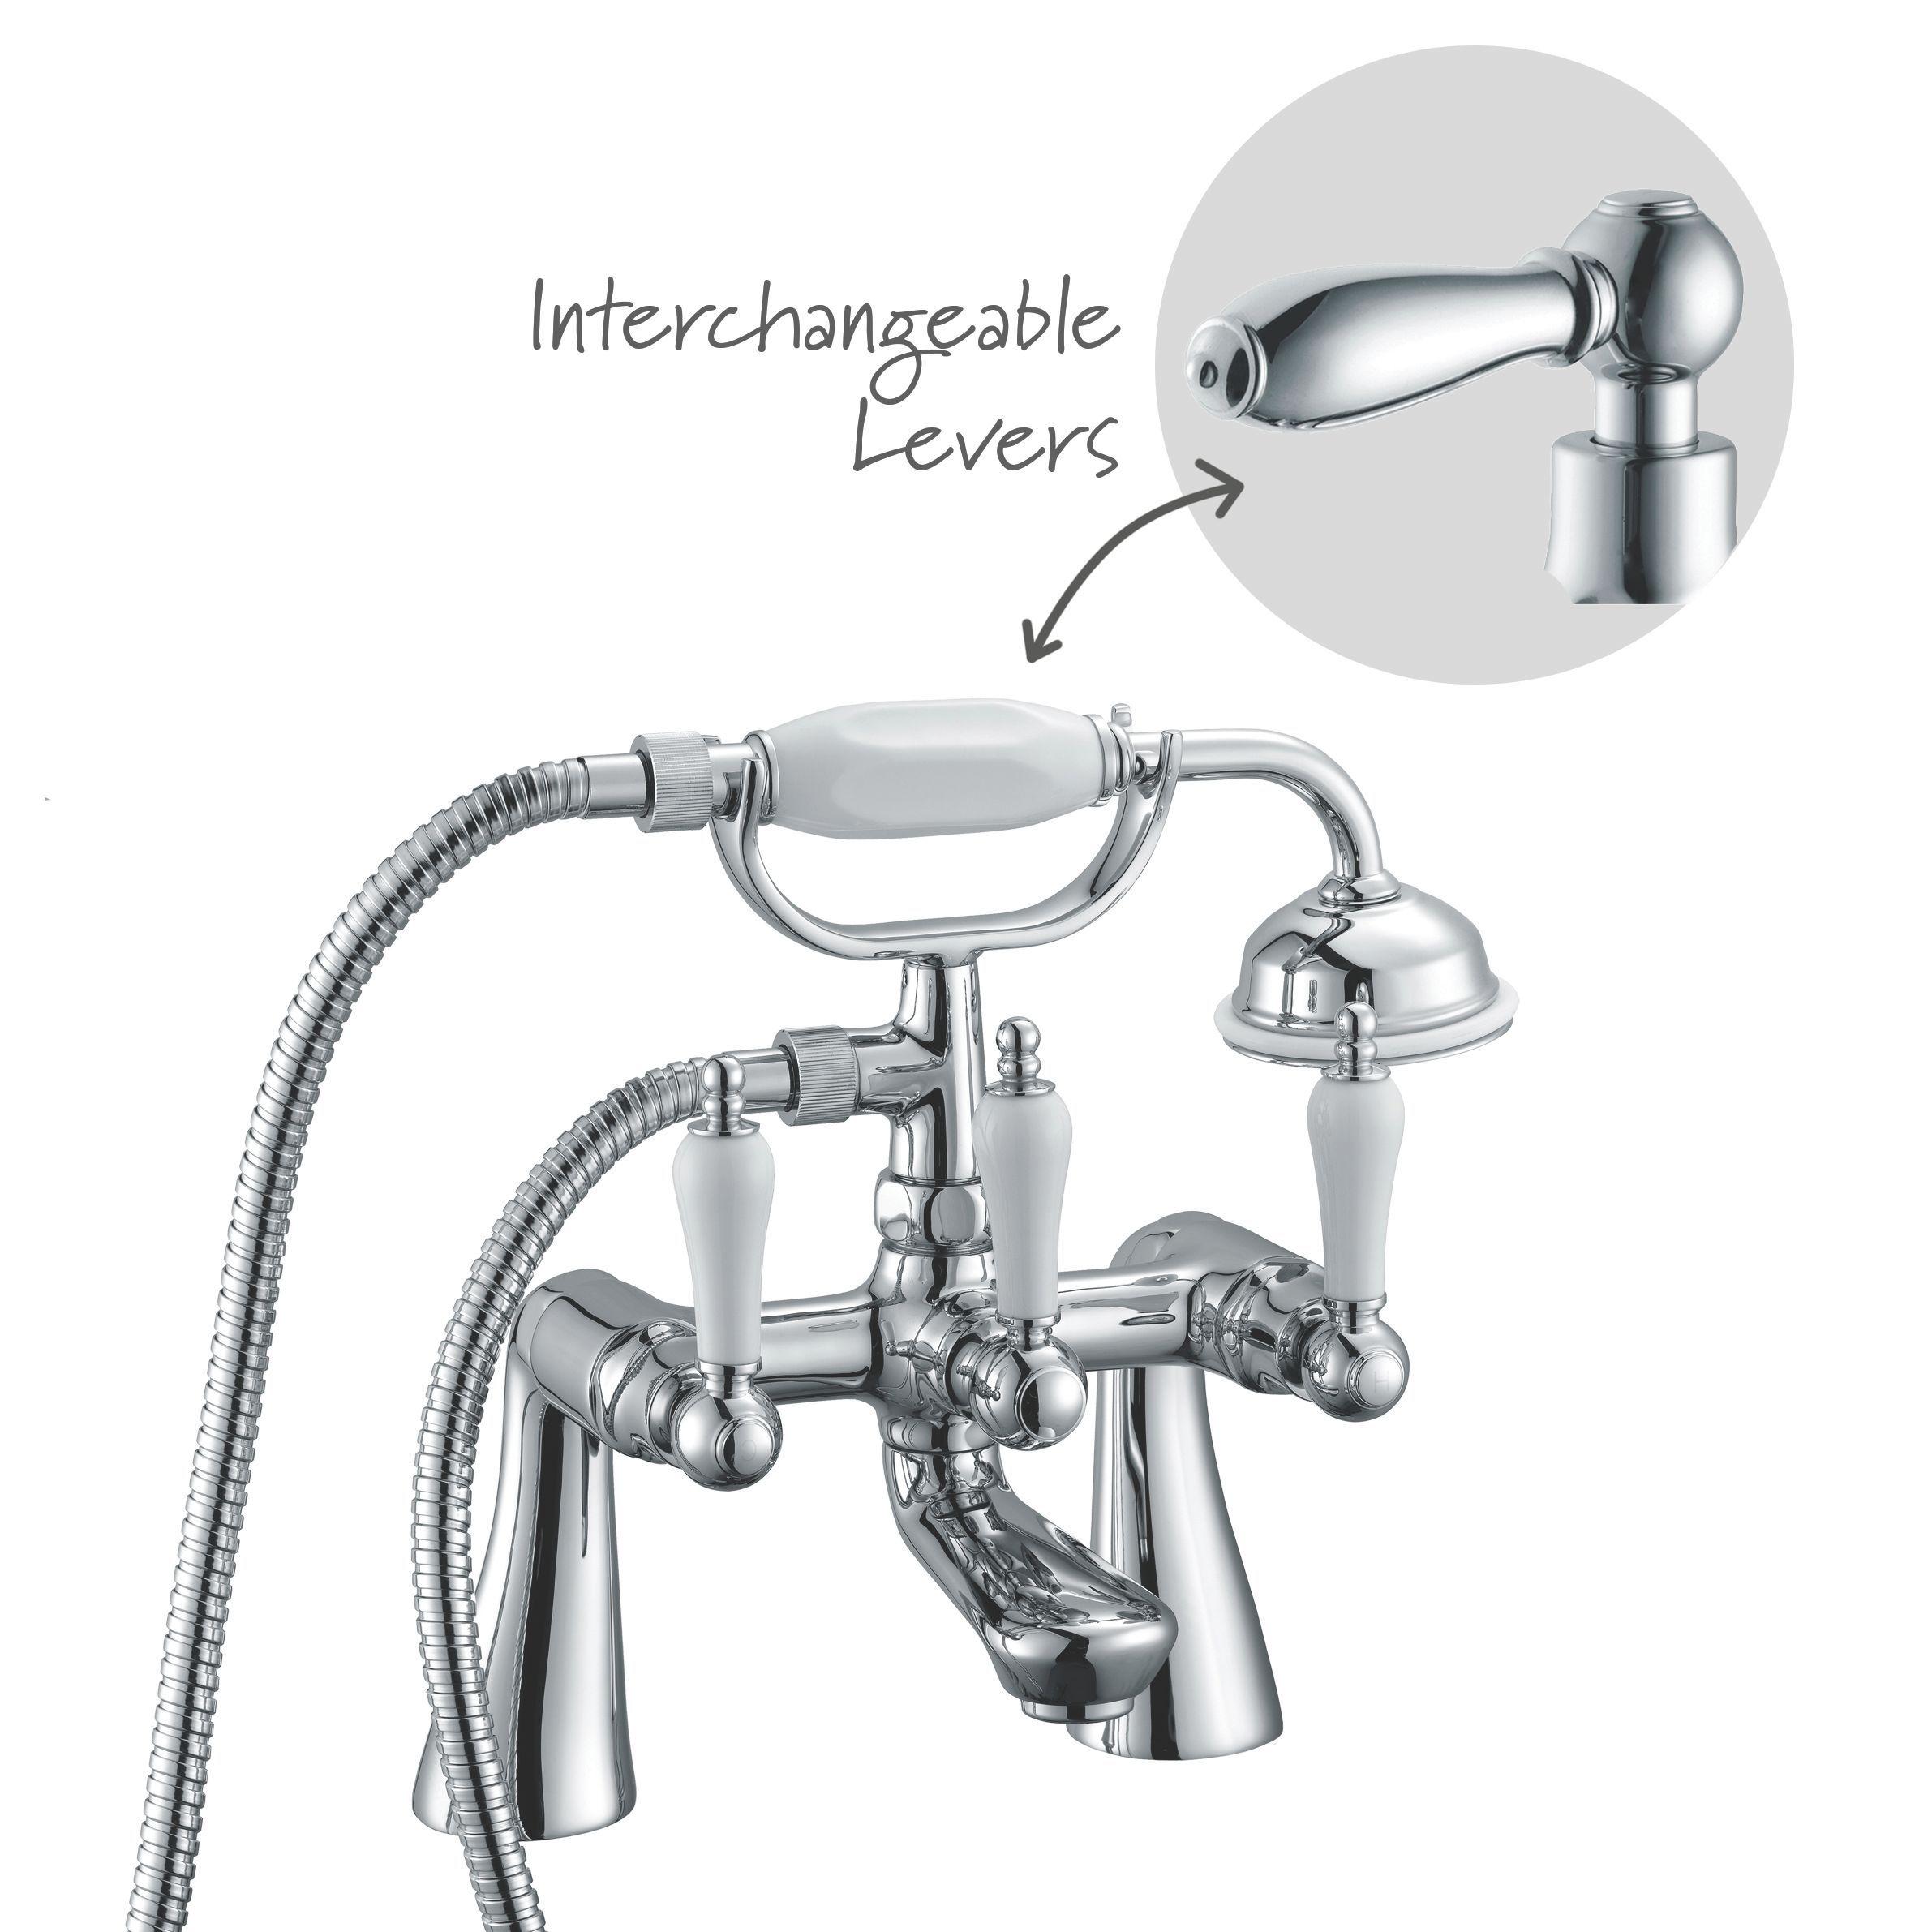 cooke lewis timeless chrome bath shower mixer tap bath shower cooke lewis timeless chrome bath shower mixer tap